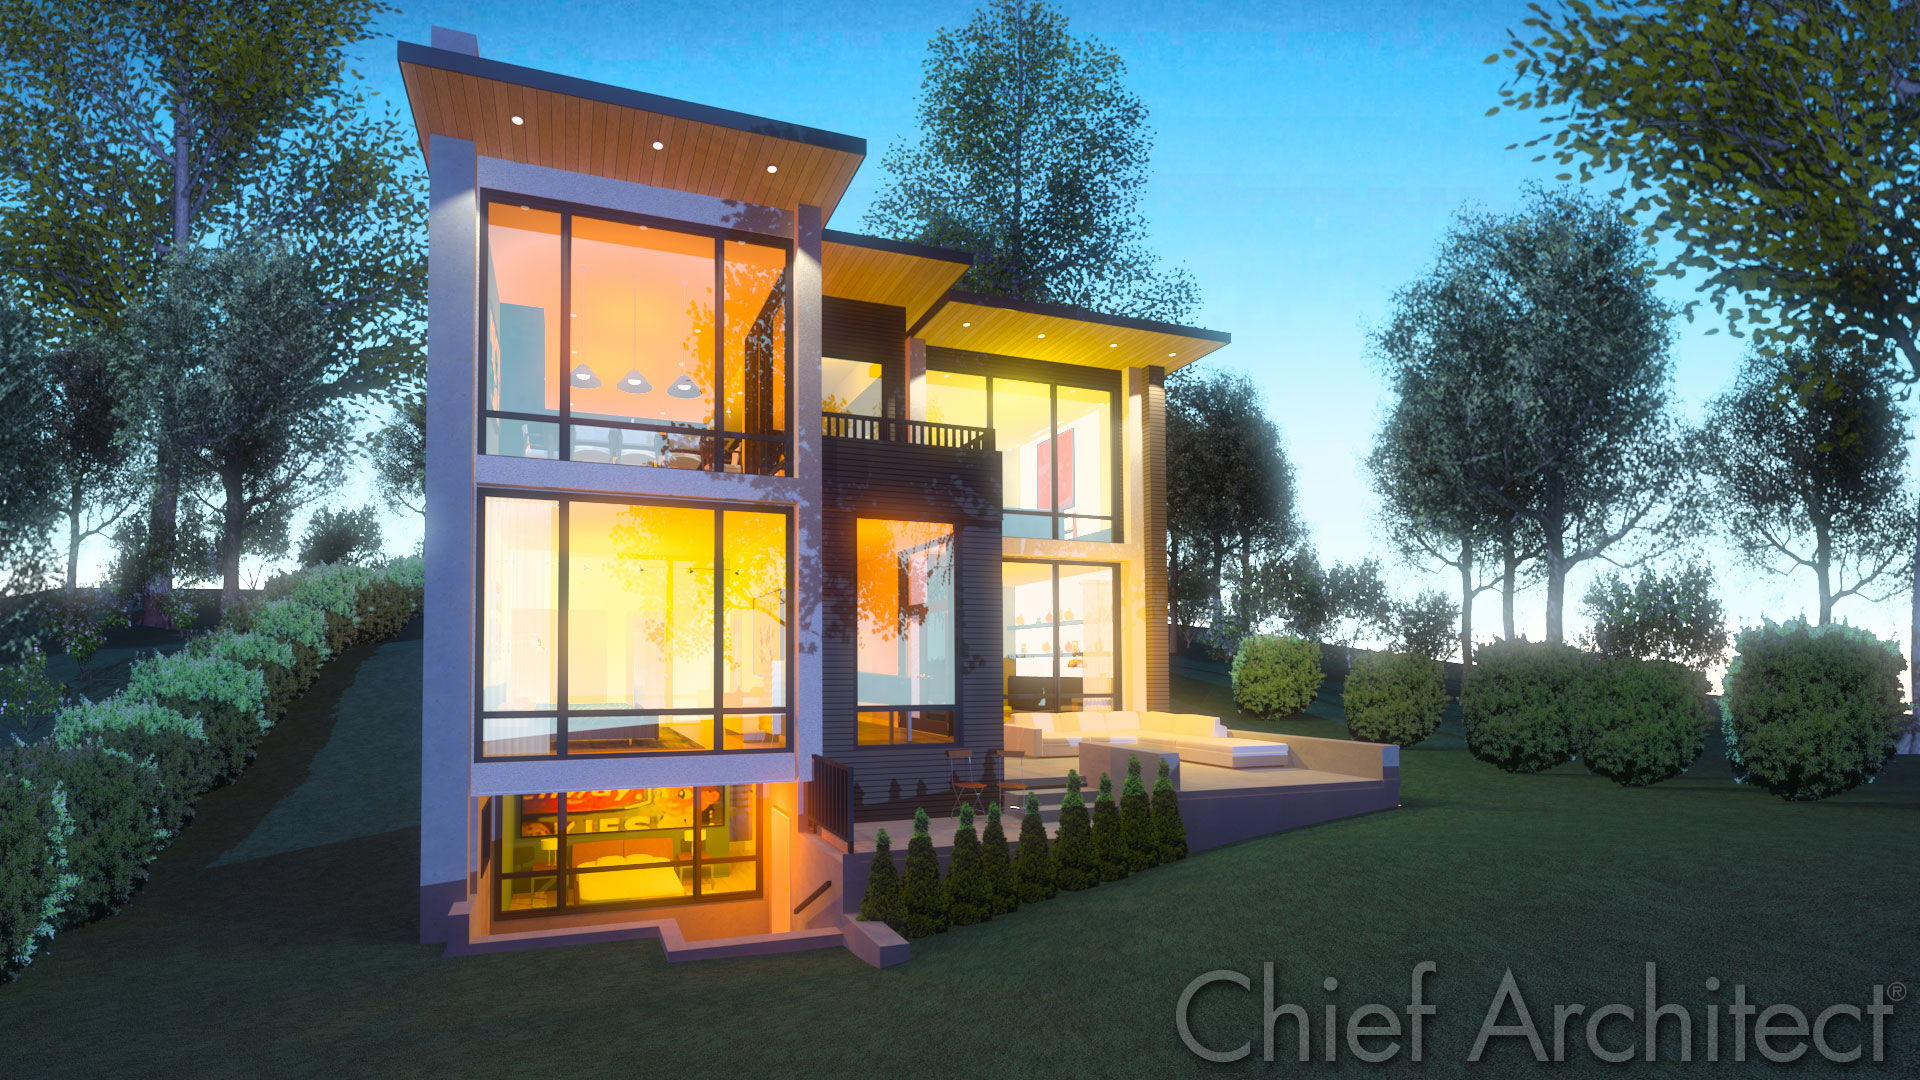 Chief architect x4 joy studio design gallery best design for Chief architect home designer suite torrent